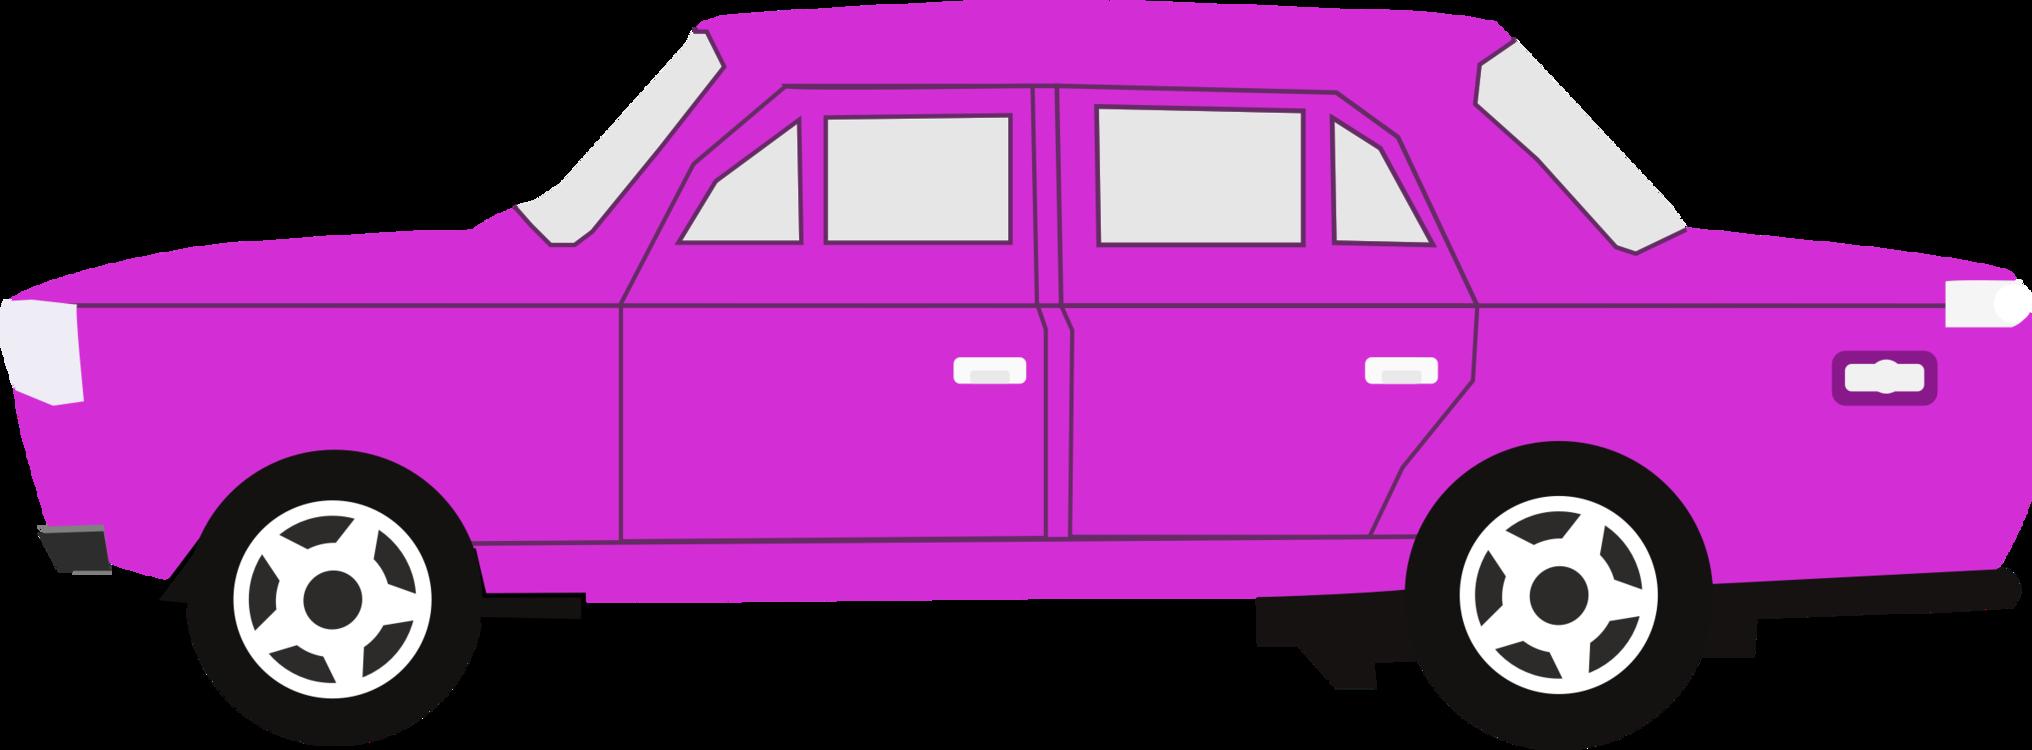 Pink,Van,Compact Car